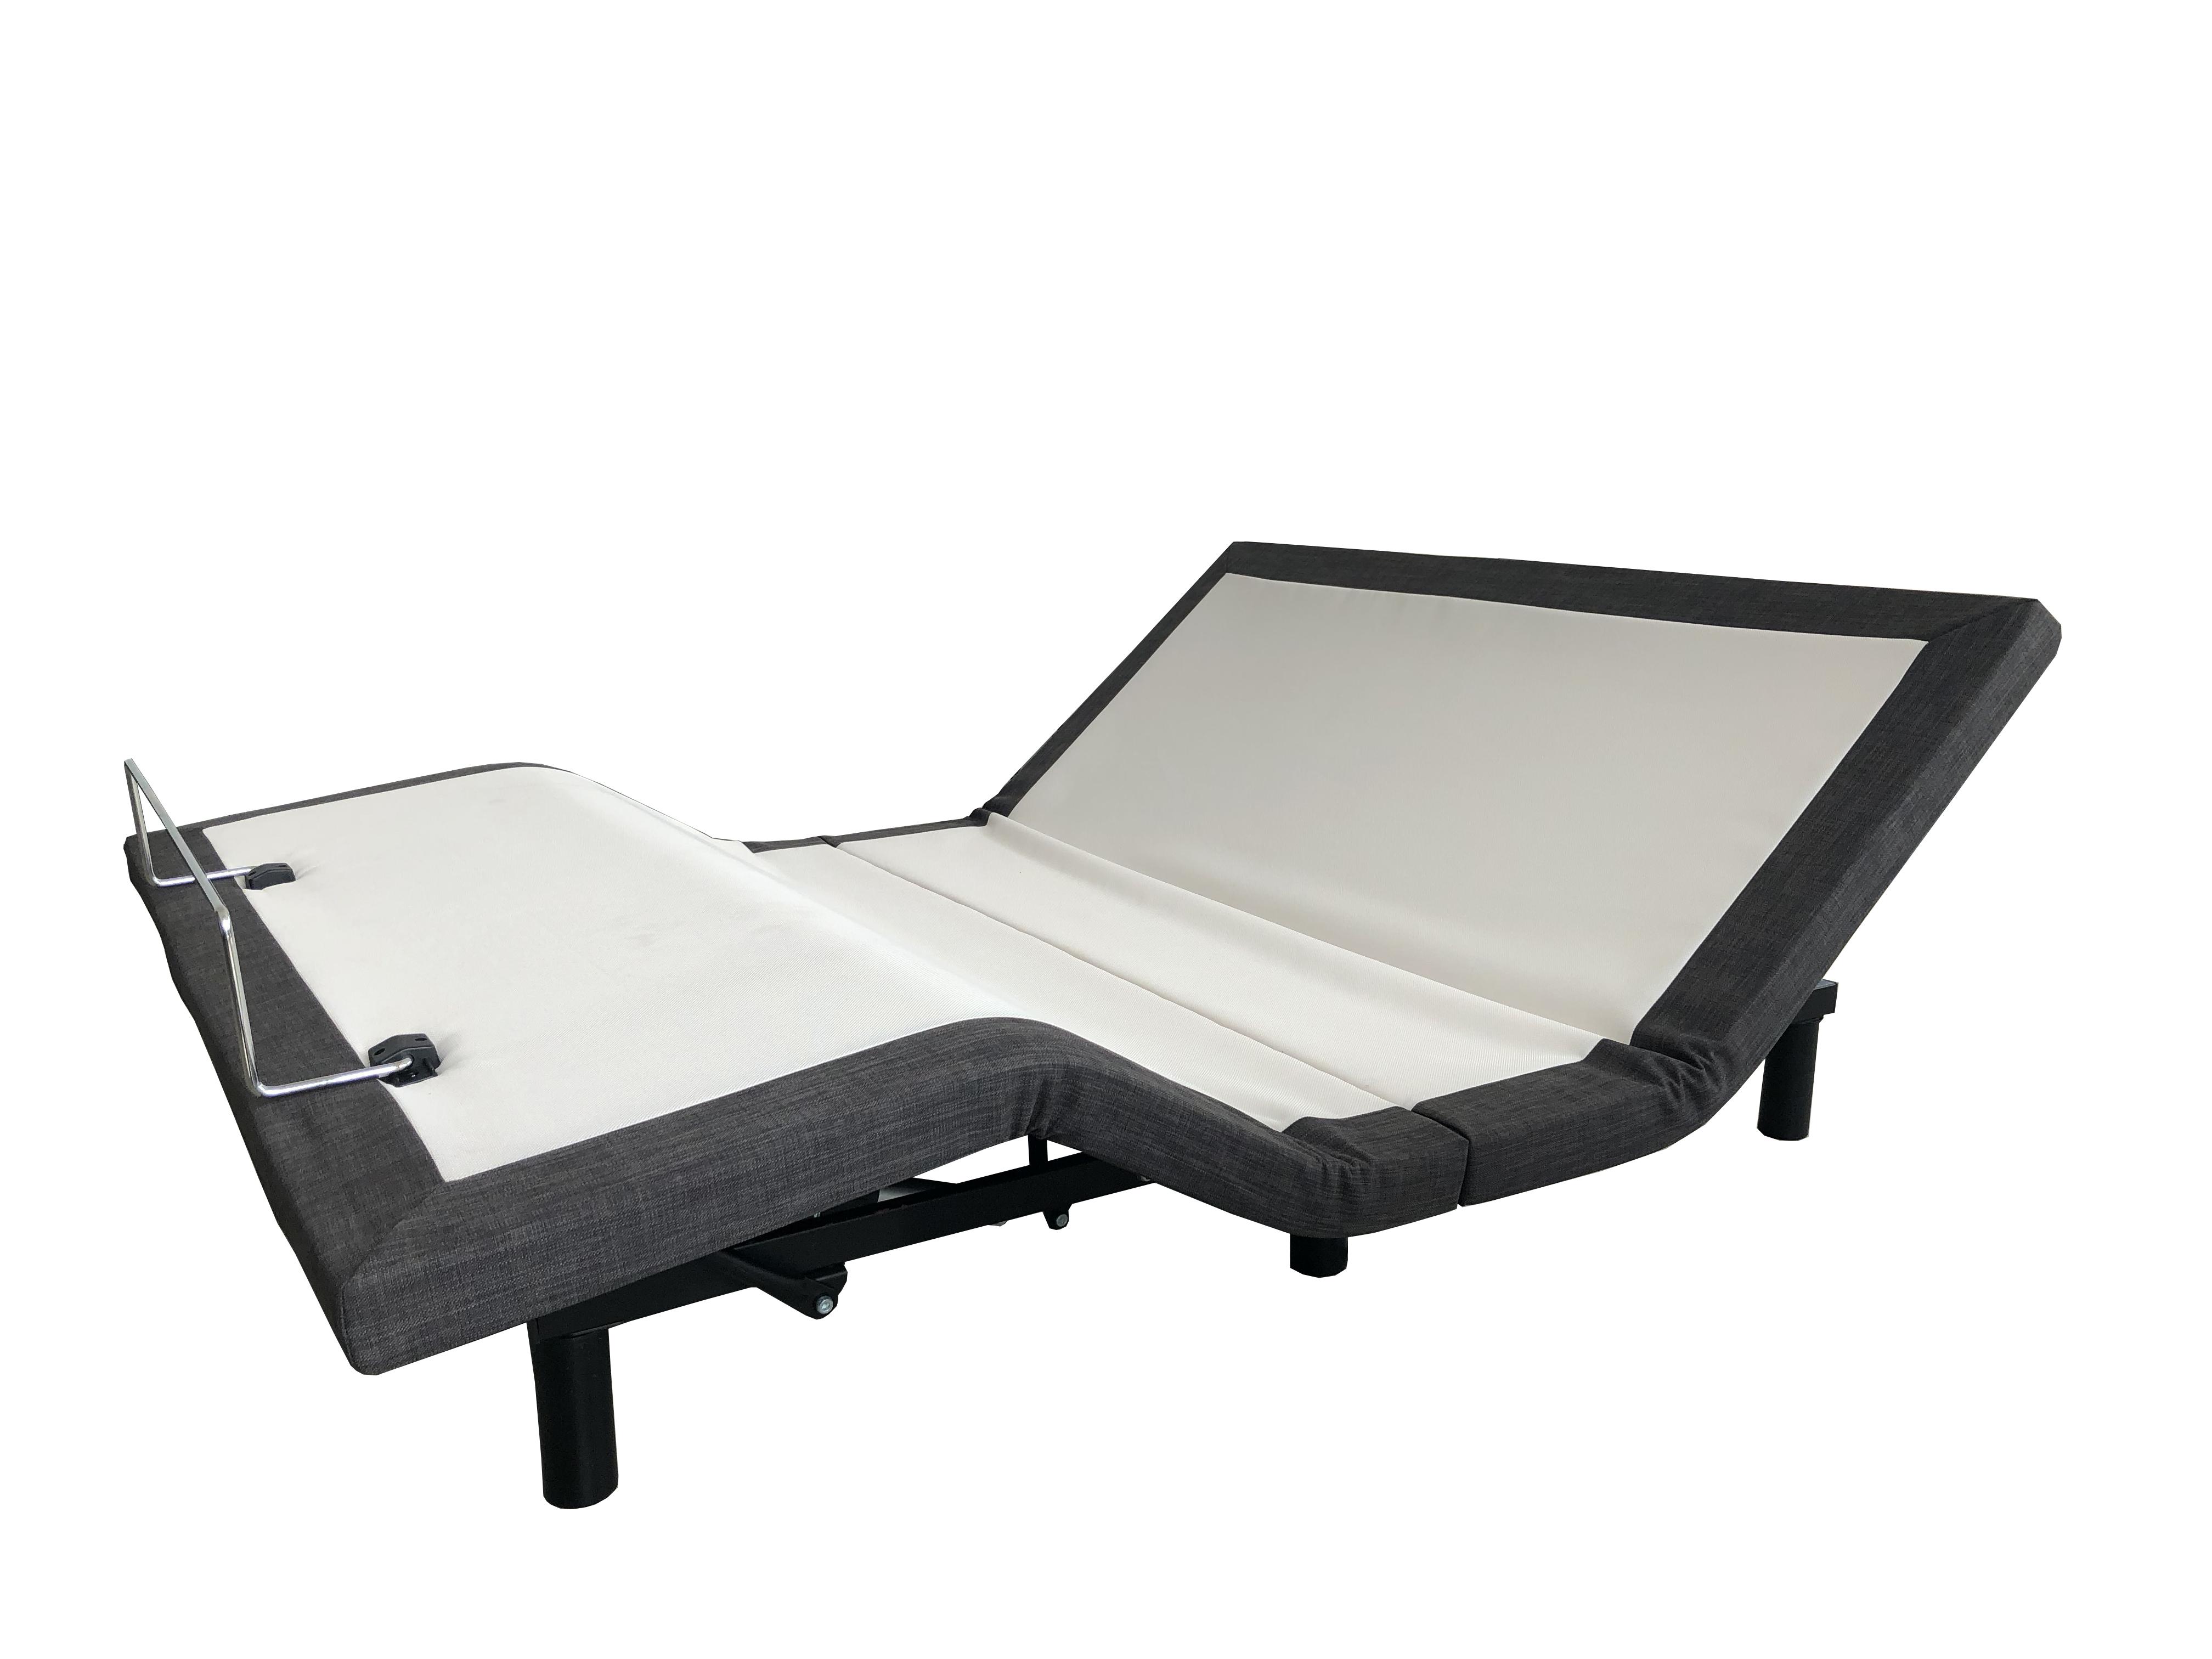 Mage Foldable Adjule Beds Base